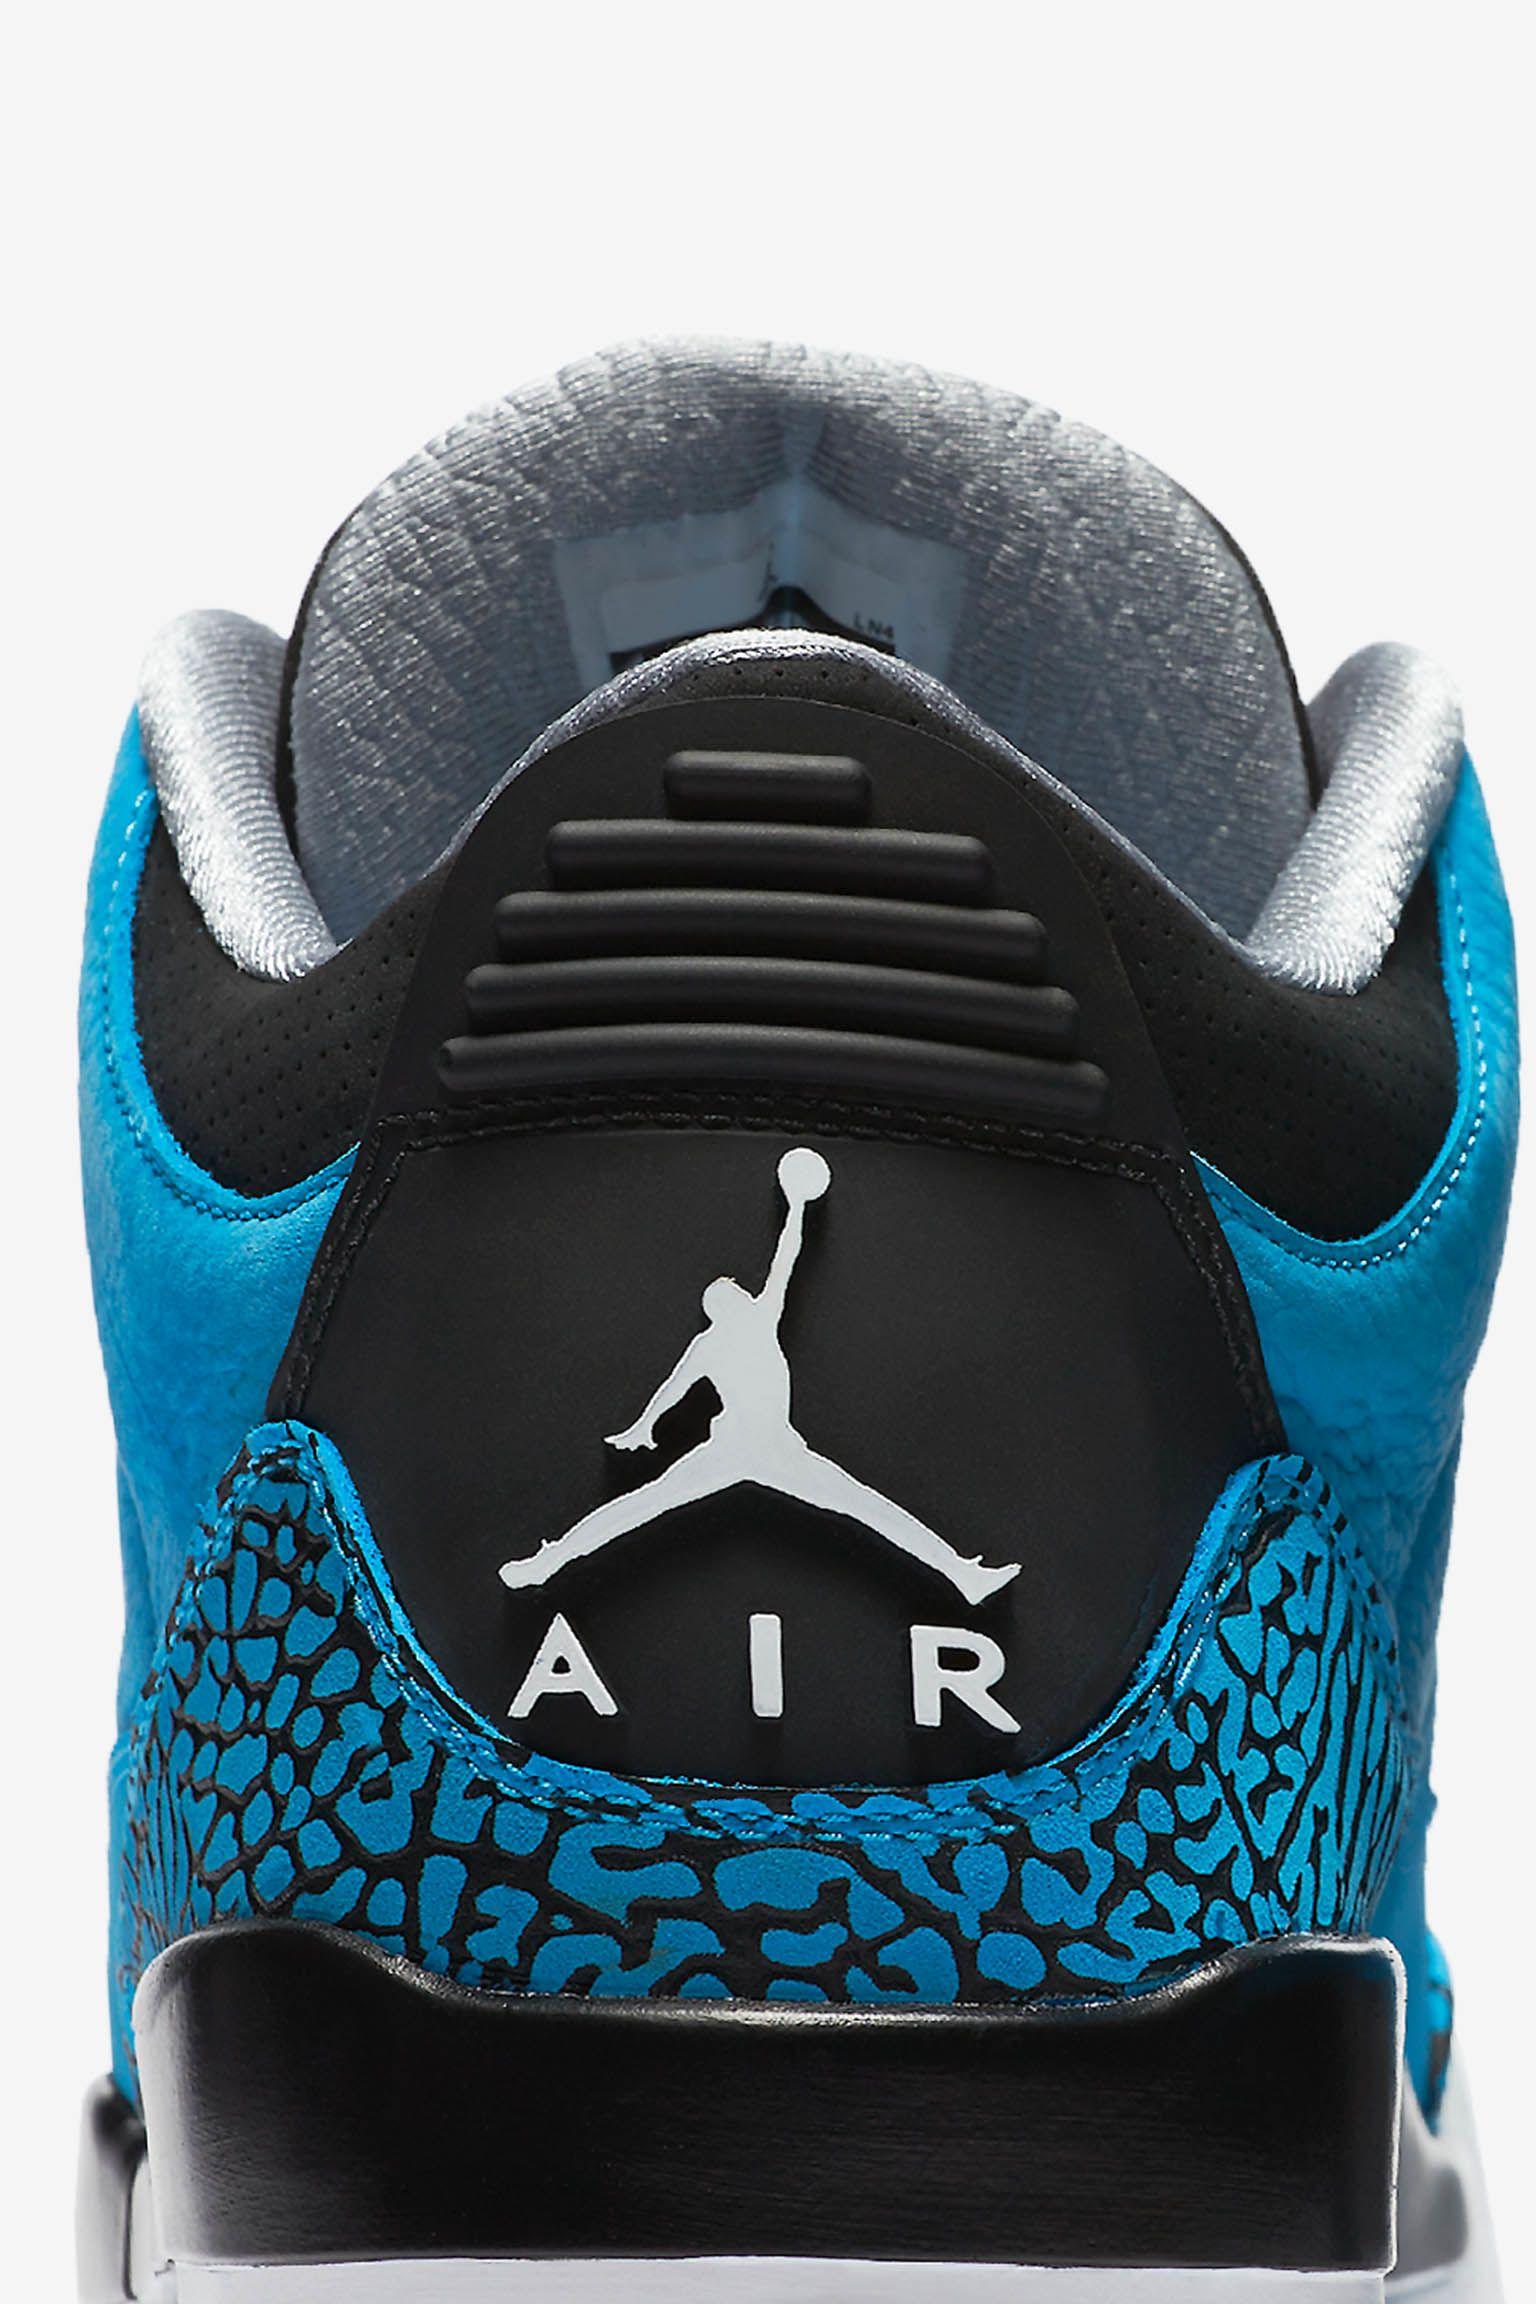 Air Jordan 3 Retro 'Powder Blue'. Release Date